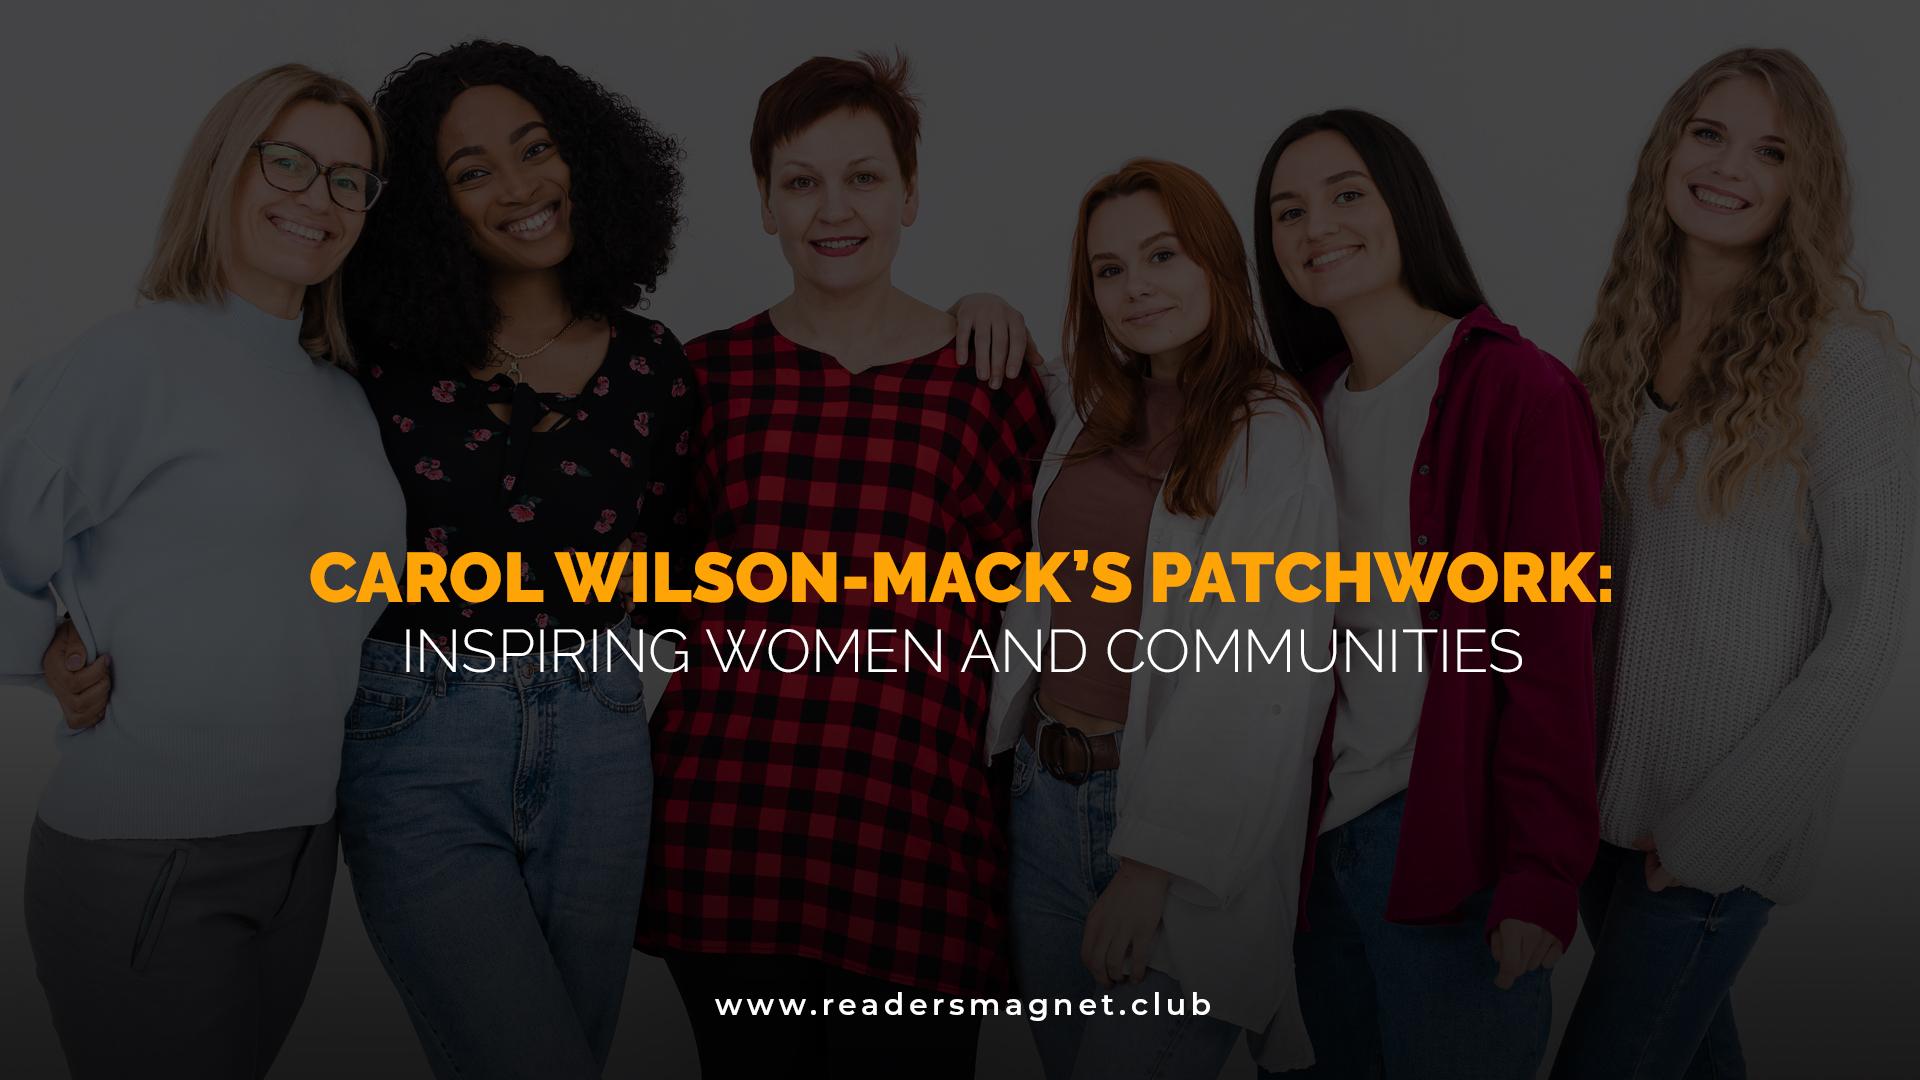 Carol Wilson-Mack's Patchwork Inspiring Women and Communities banner